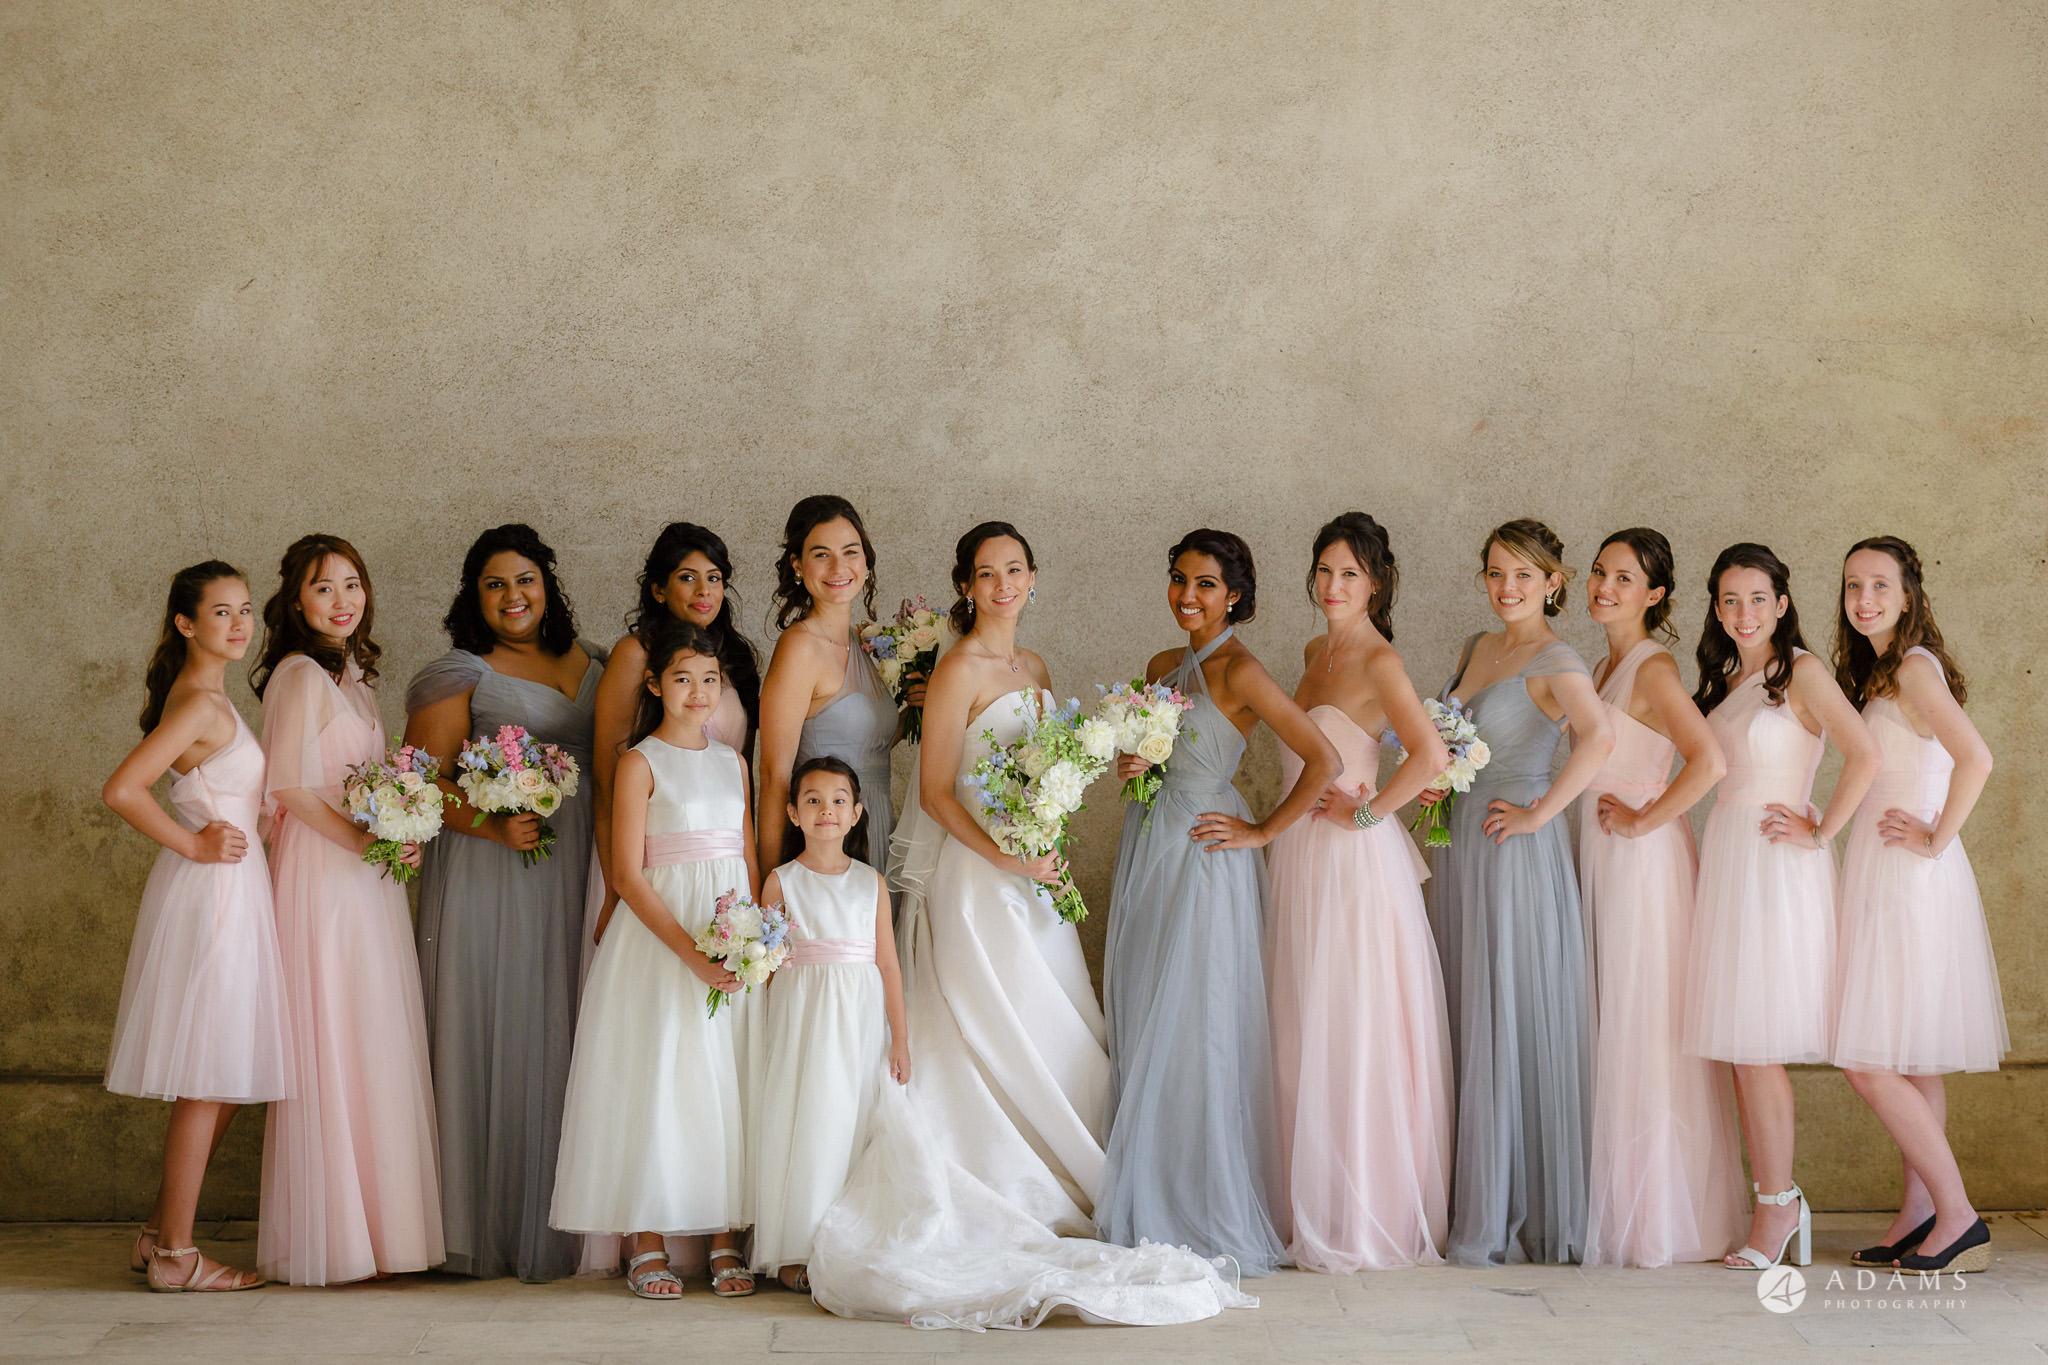 Trinity College Cambridge wedding bride and bridesmaids group photo